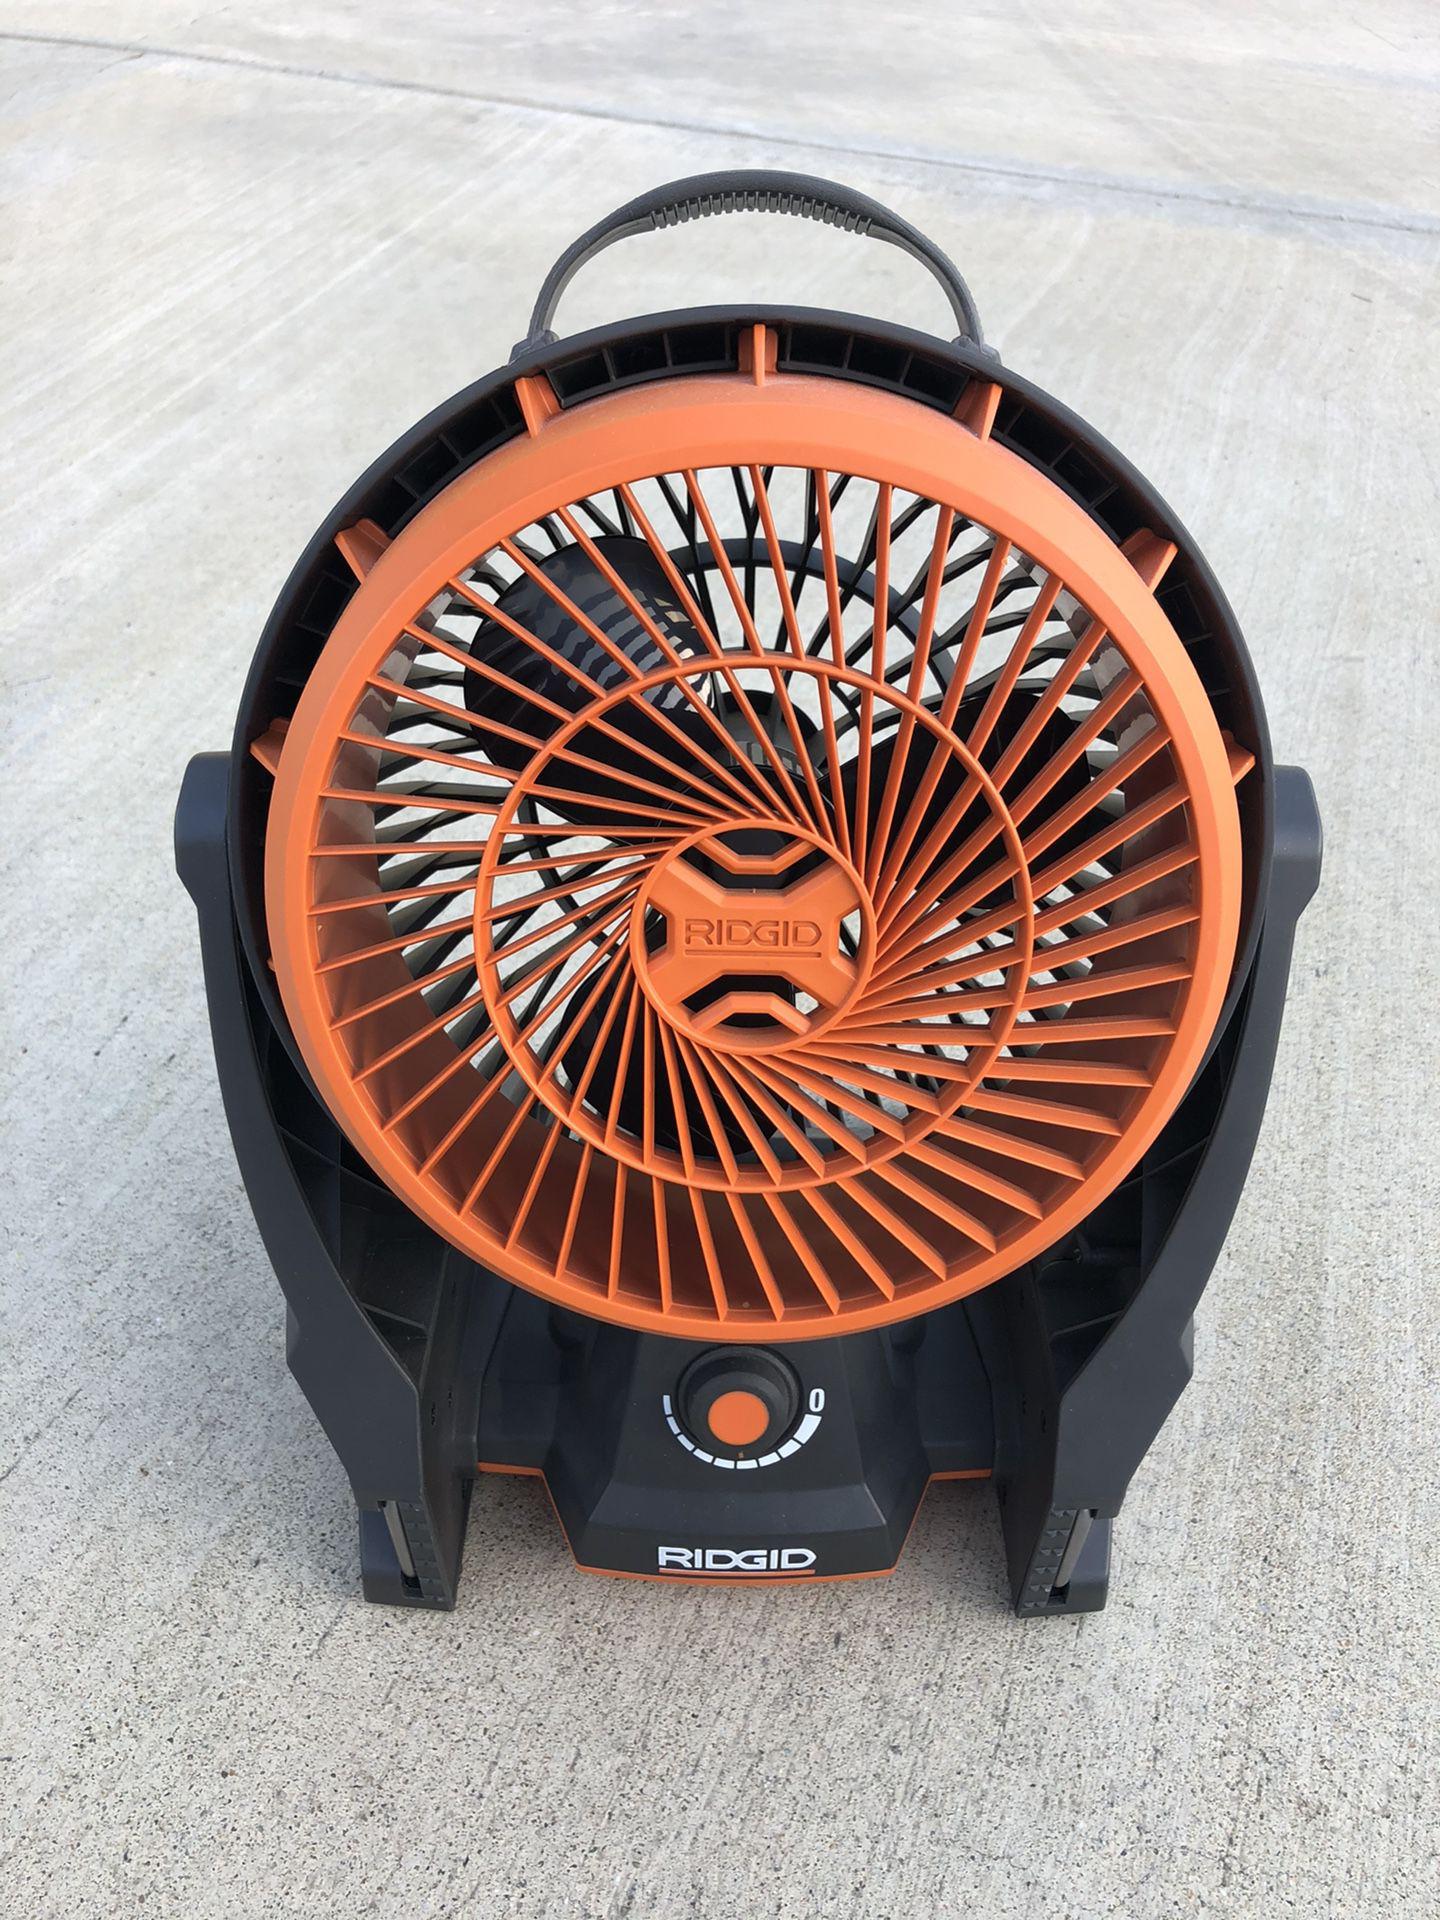 Ridgid 18 - Volt Hybrid Fan.